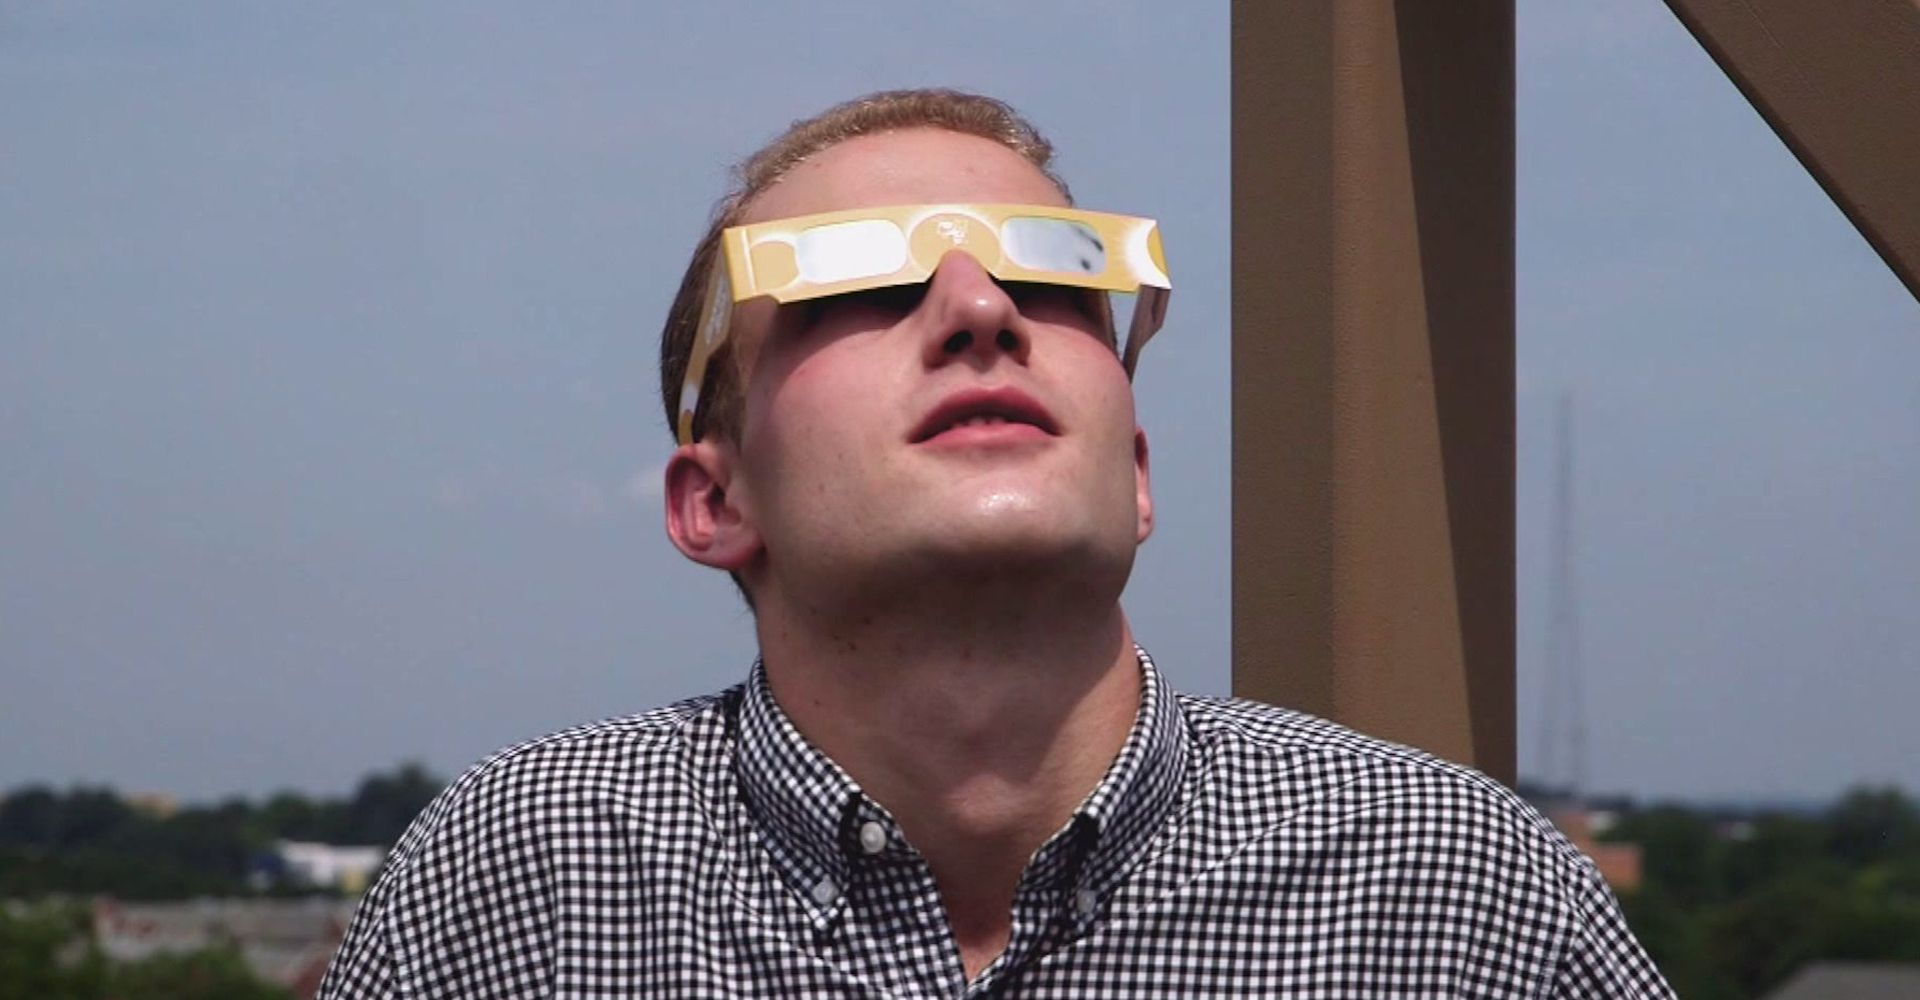 A man wears special eyewear for watching the solar eclipse. (Credit: KTLA)